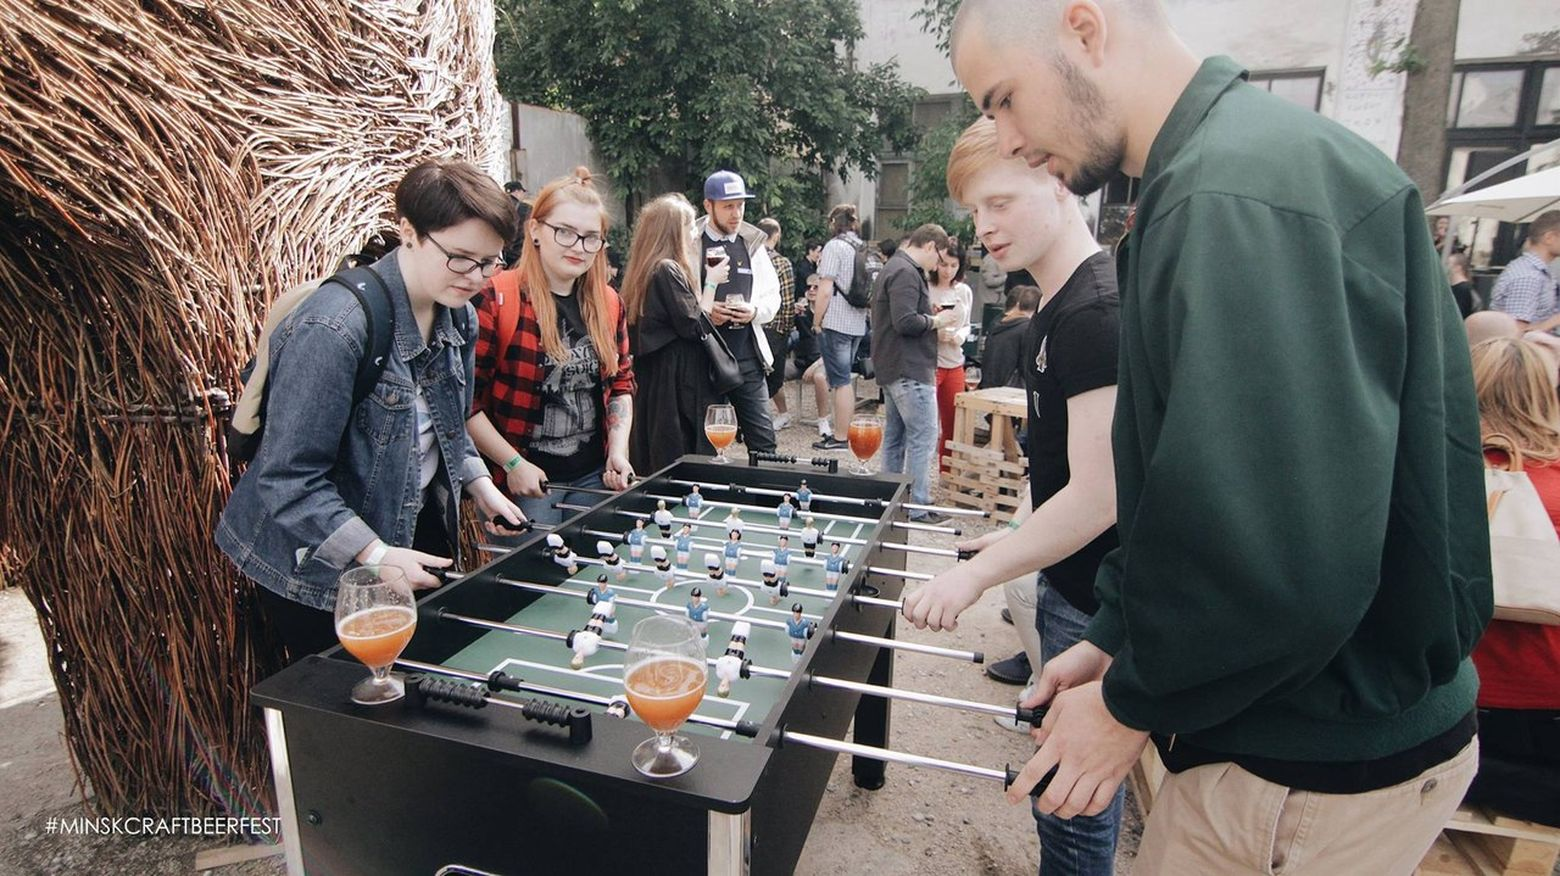 Minsk Craft Beer Fest, Минск, 21 апреля